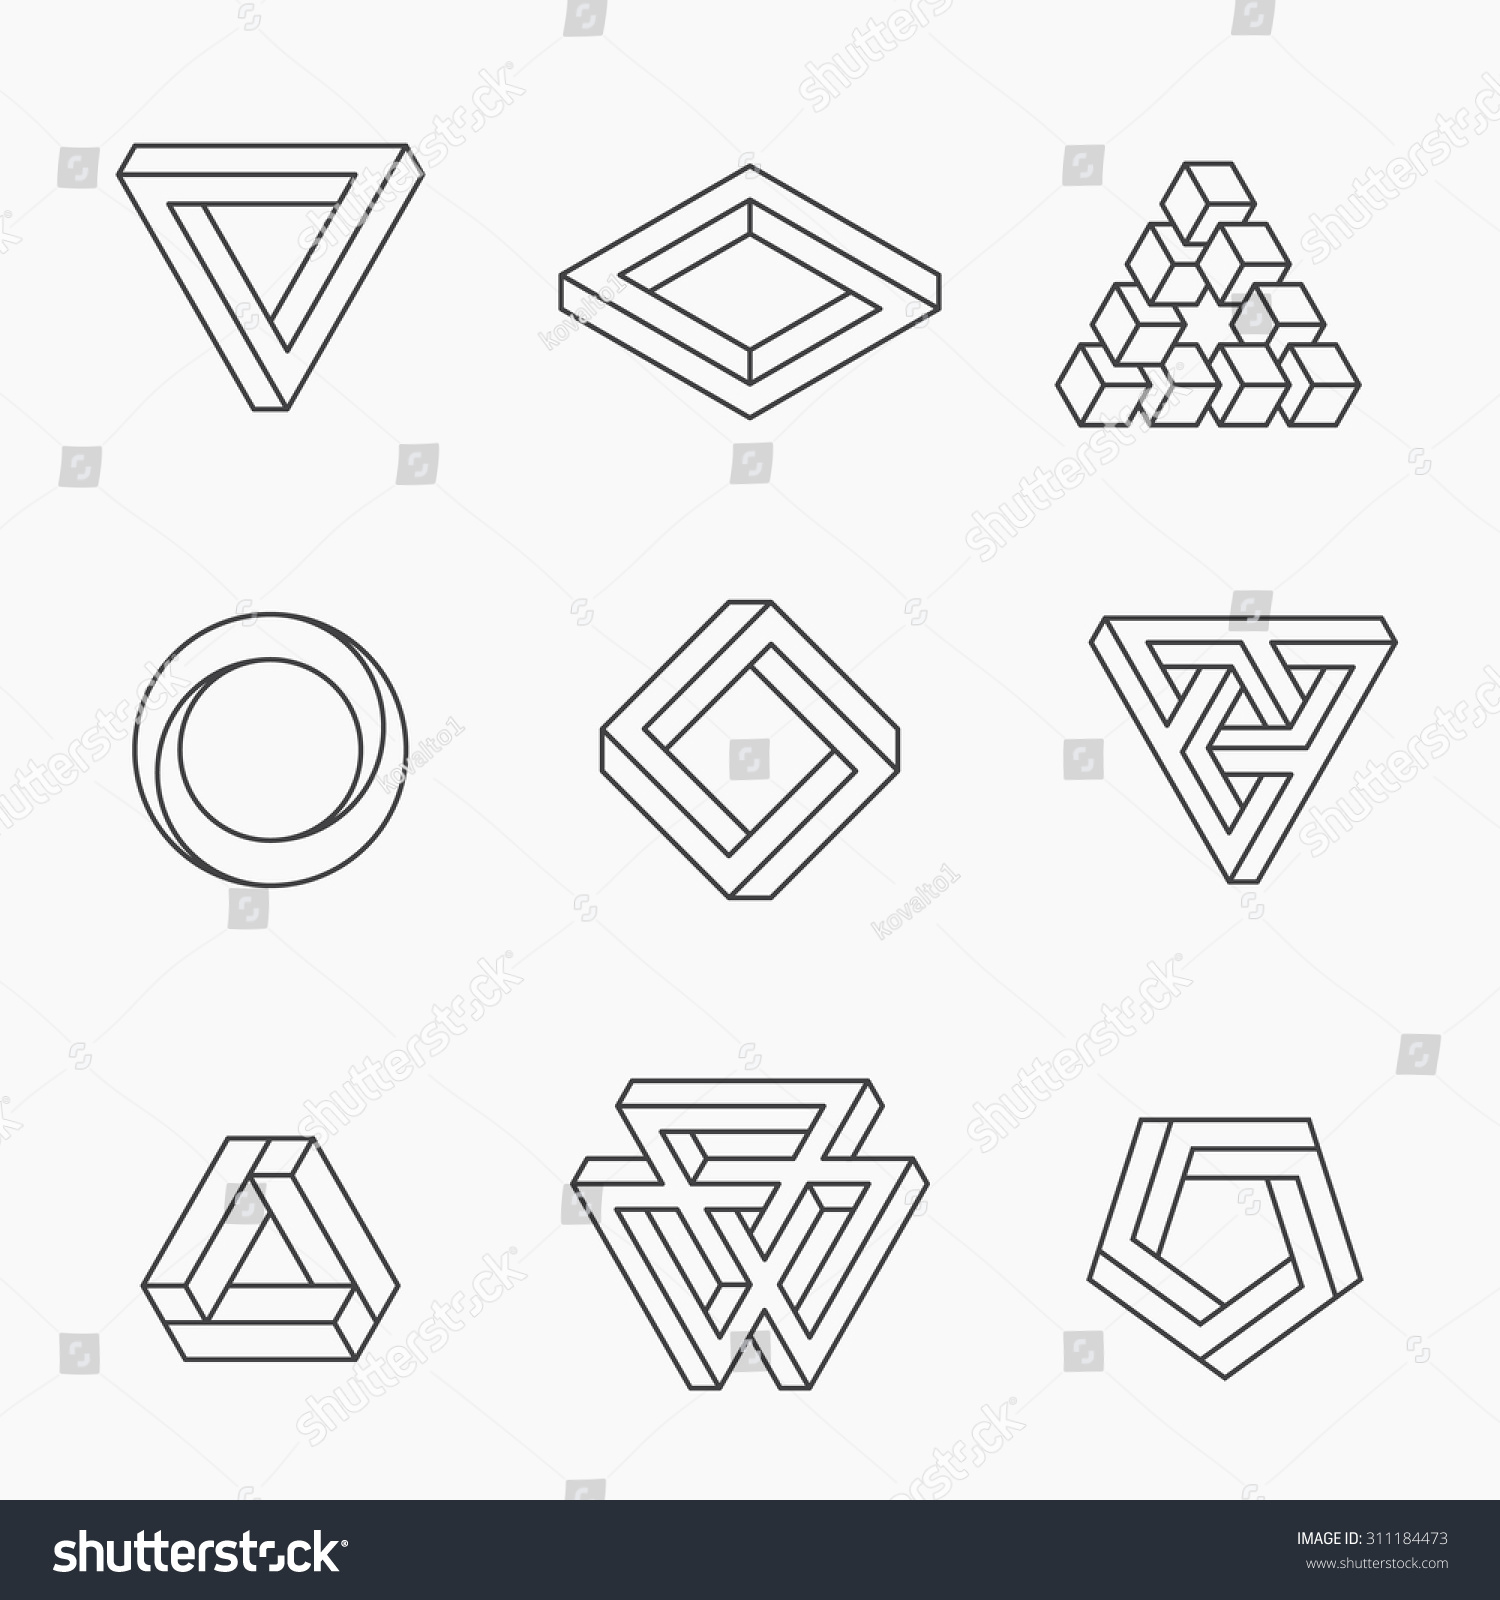 Line And Shape Design : Set impossible shapes vector line design stock